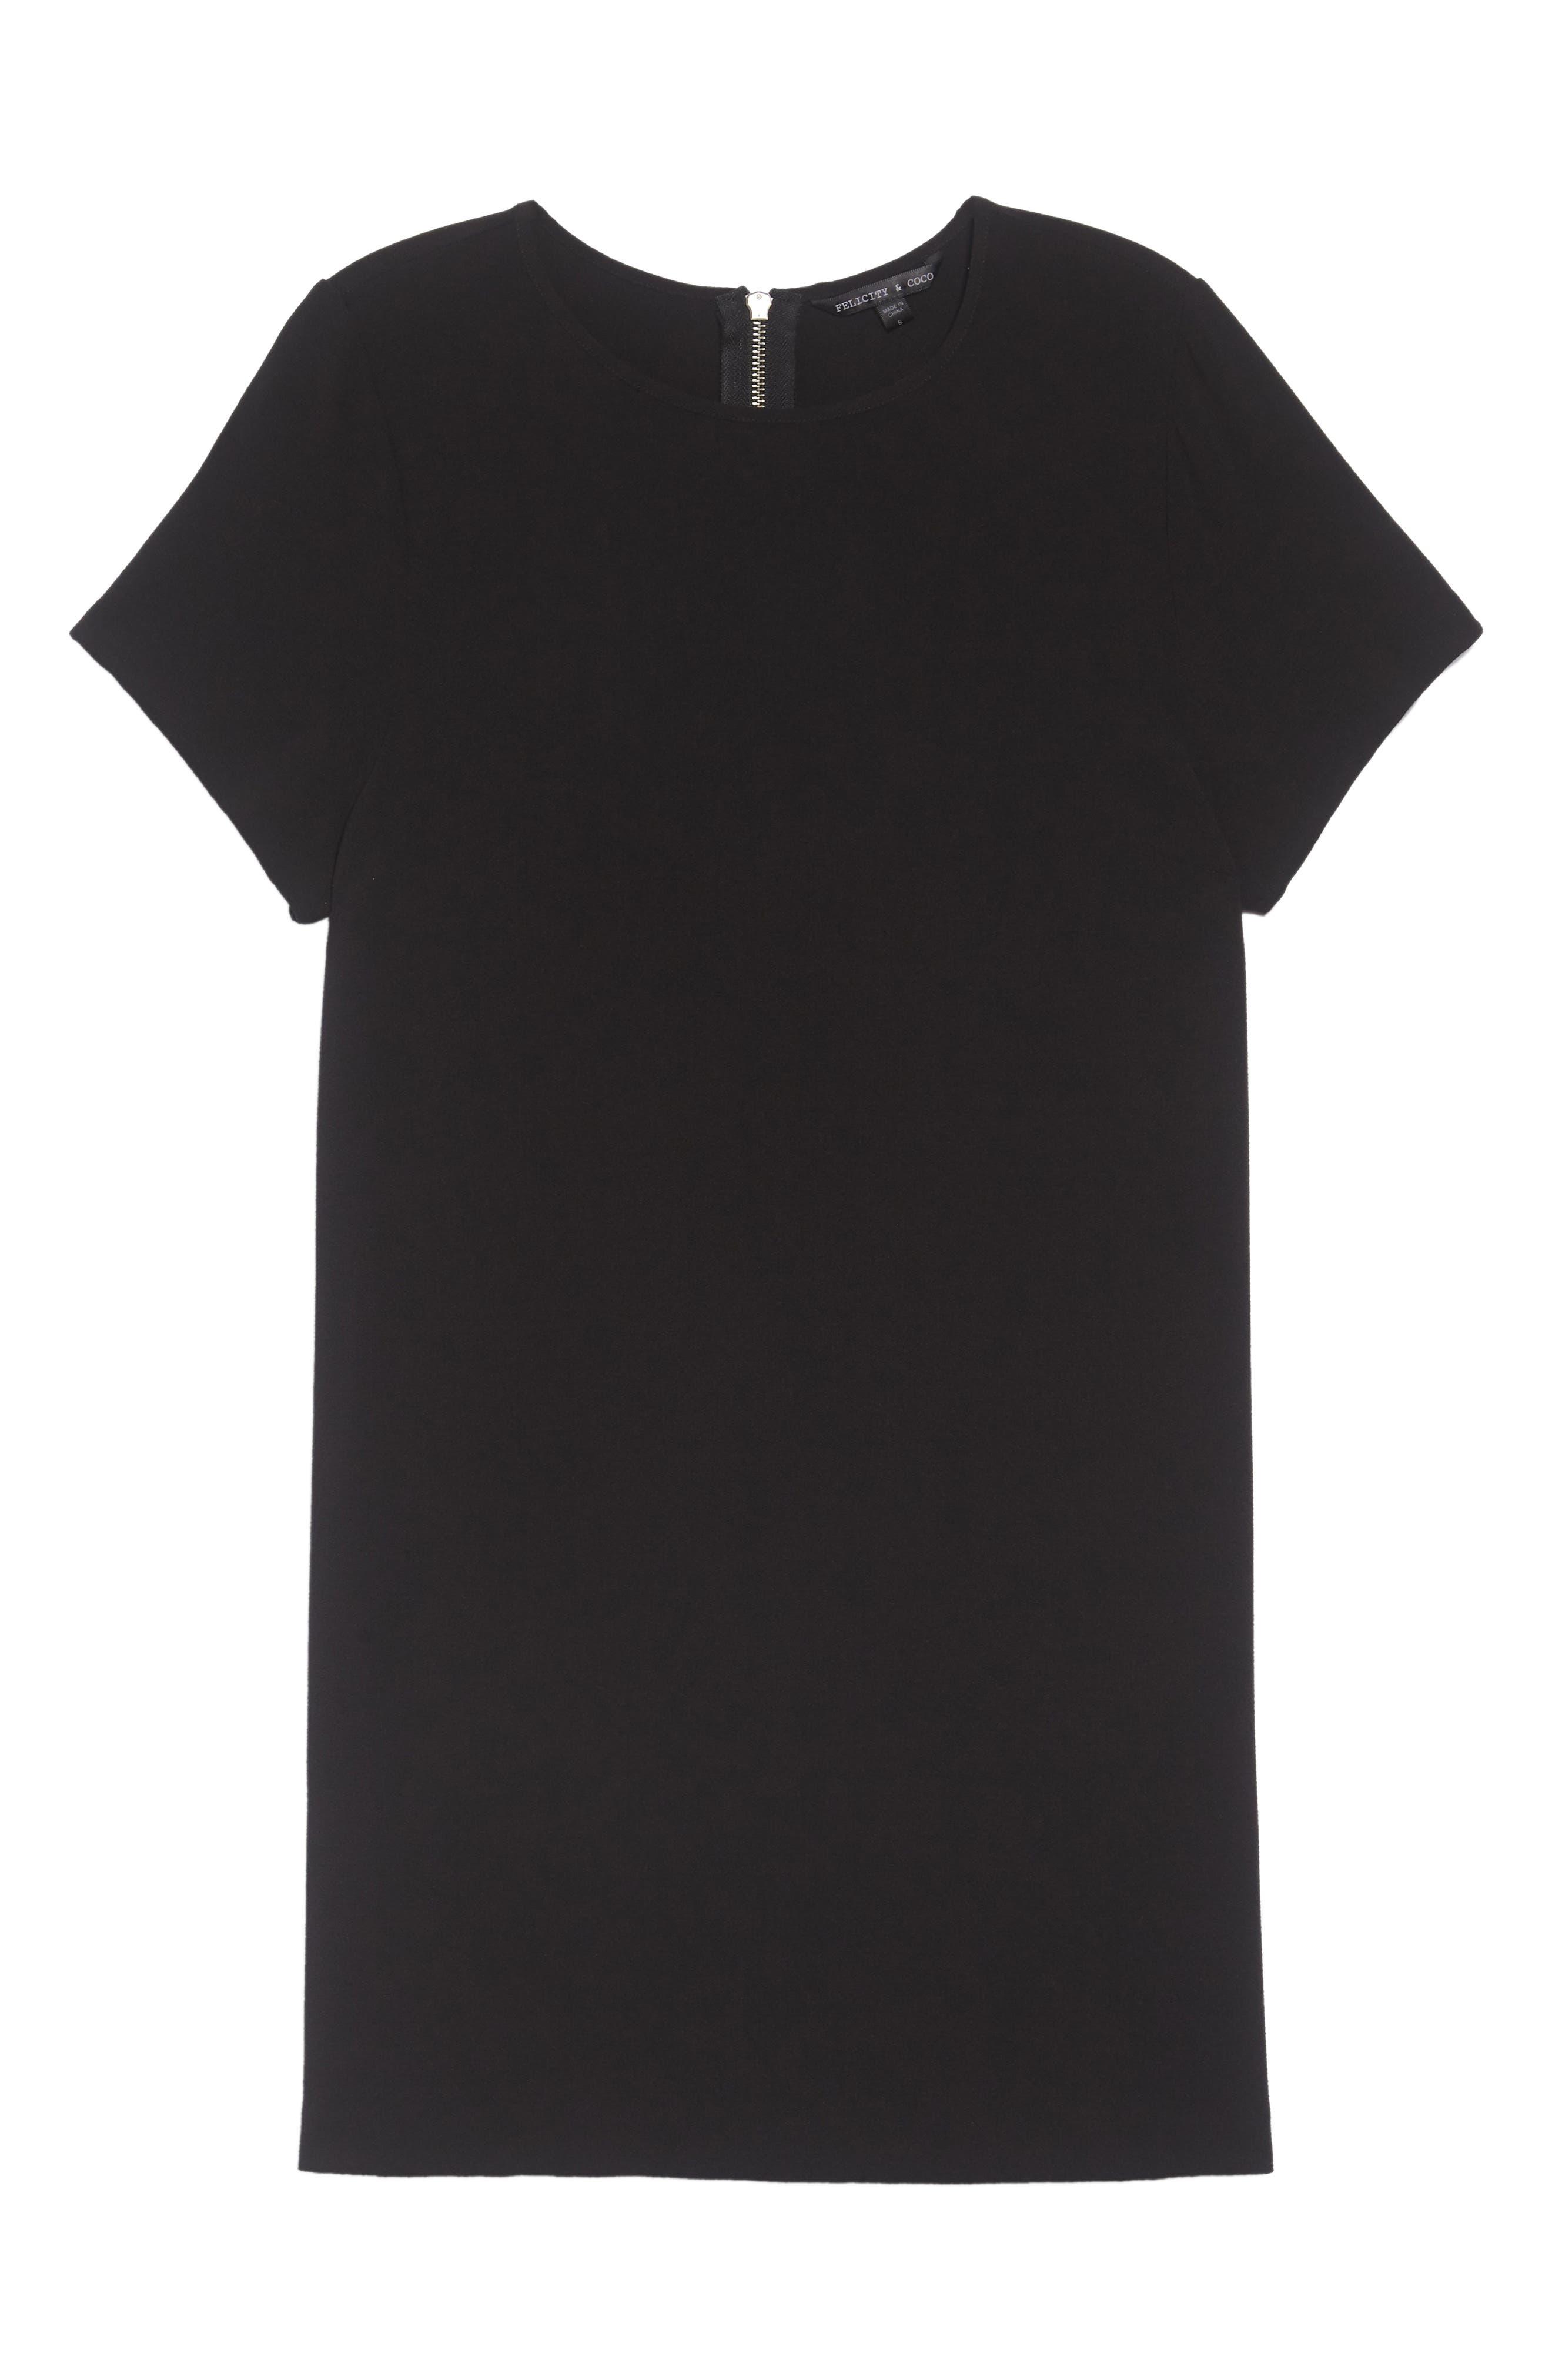 FELICITY & COCO, Devery Crepe Shift Dress, Alternate thumbnail 2, color, 001